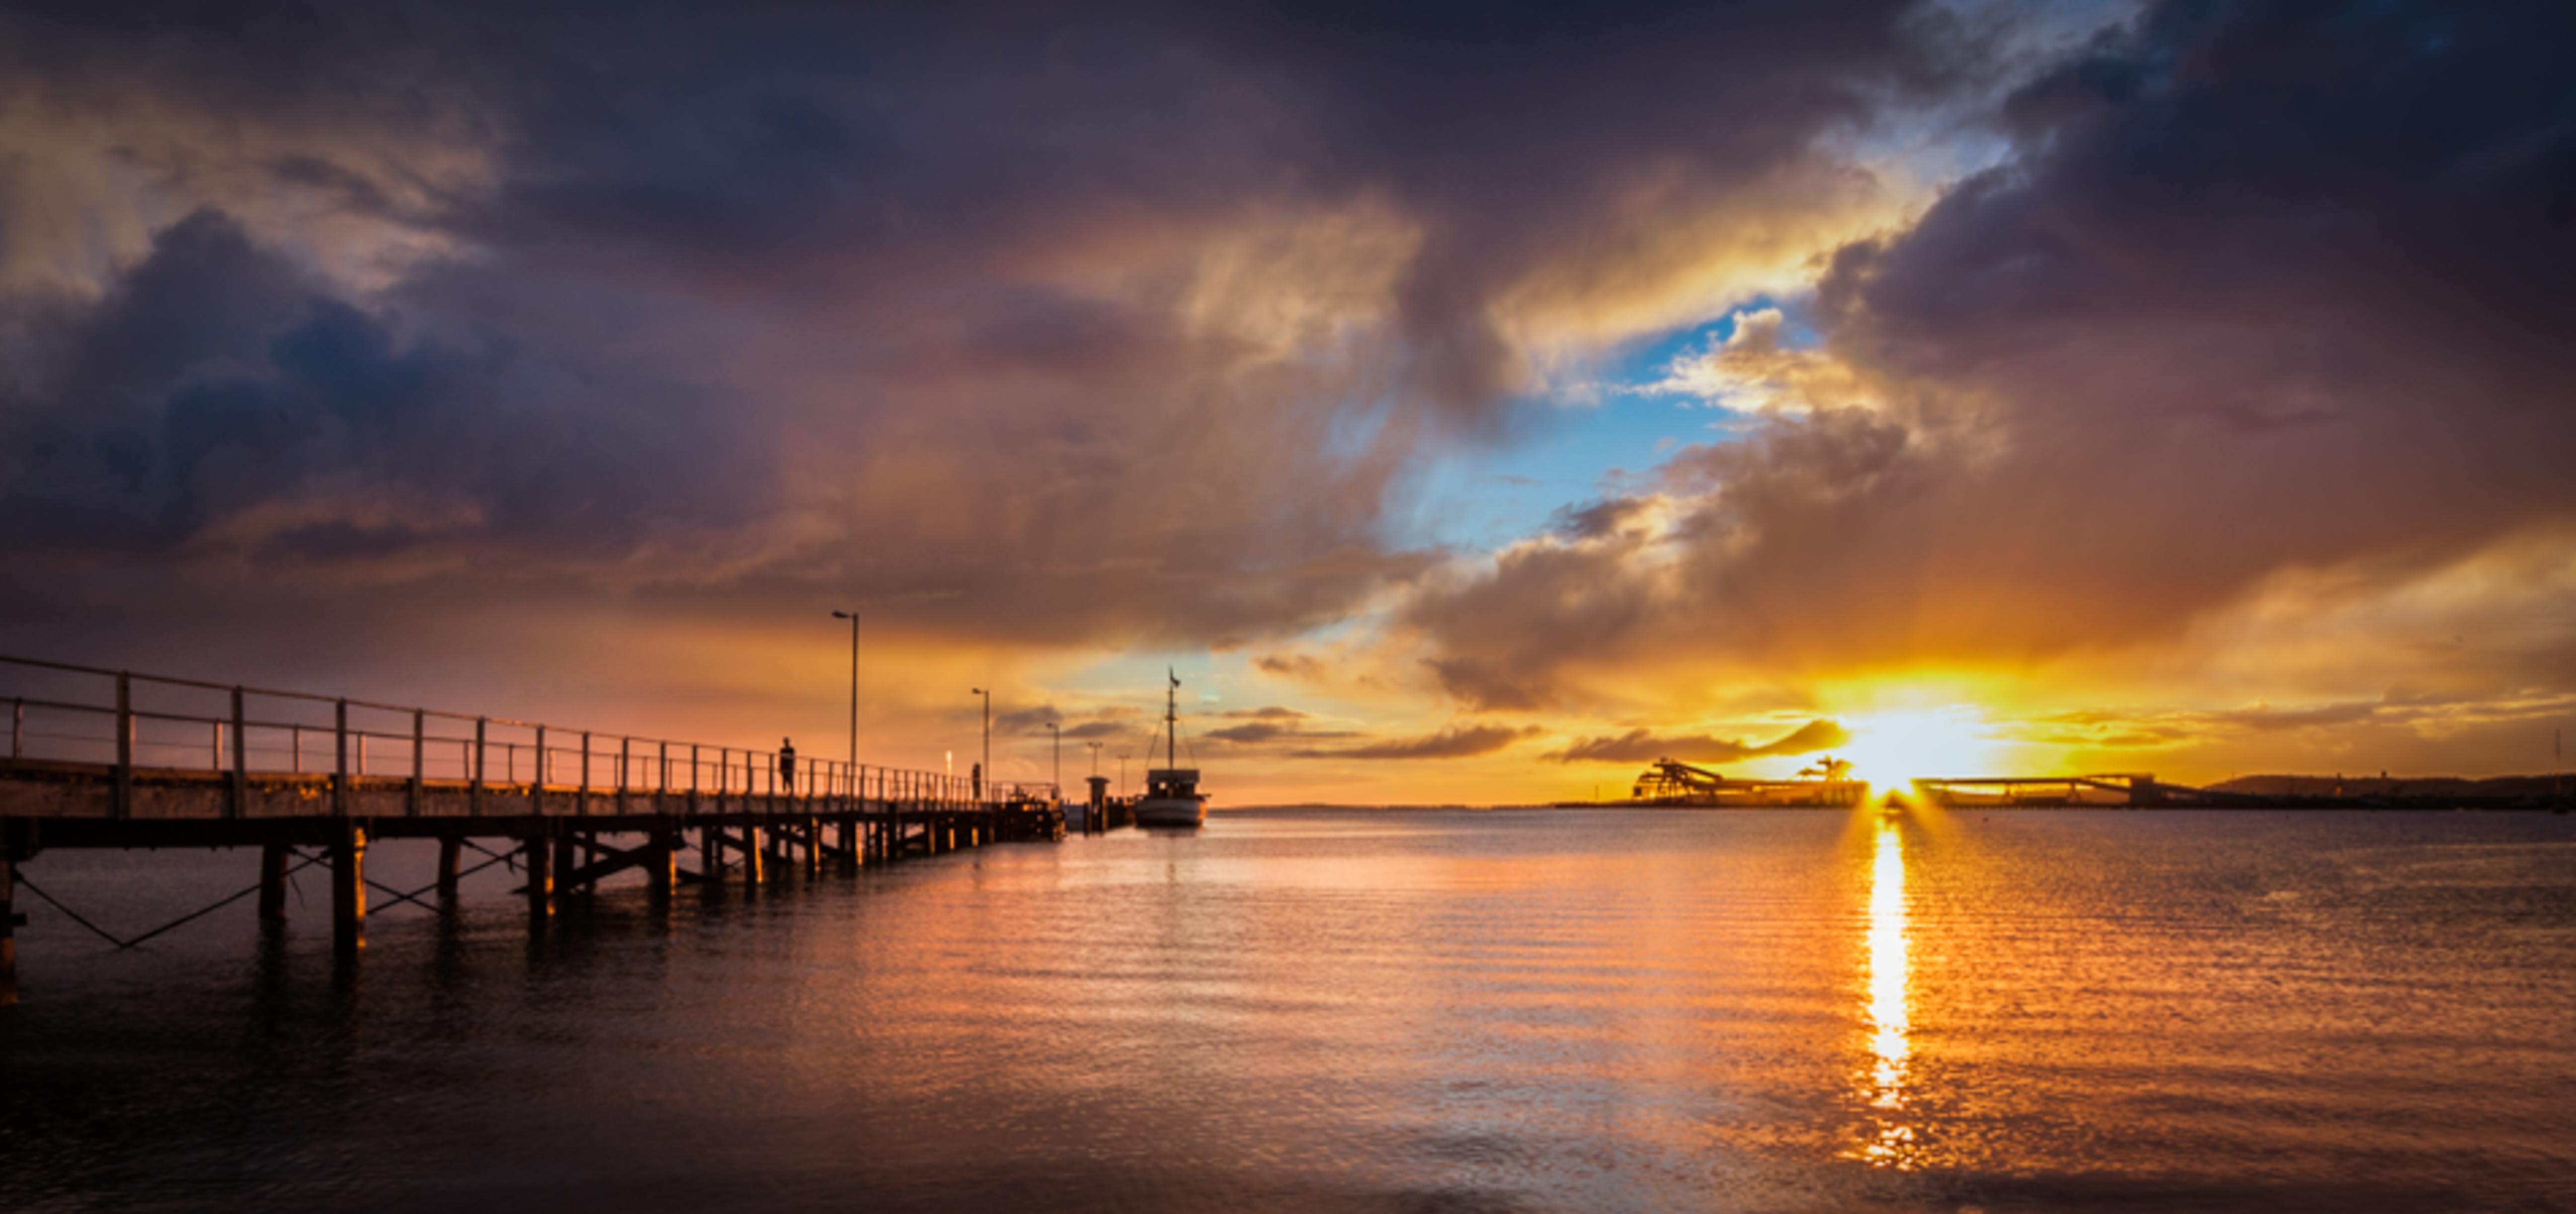 Port Lincoln Australia  city images : Description Port Lincoln Town Jetty at Sunrise South Australia